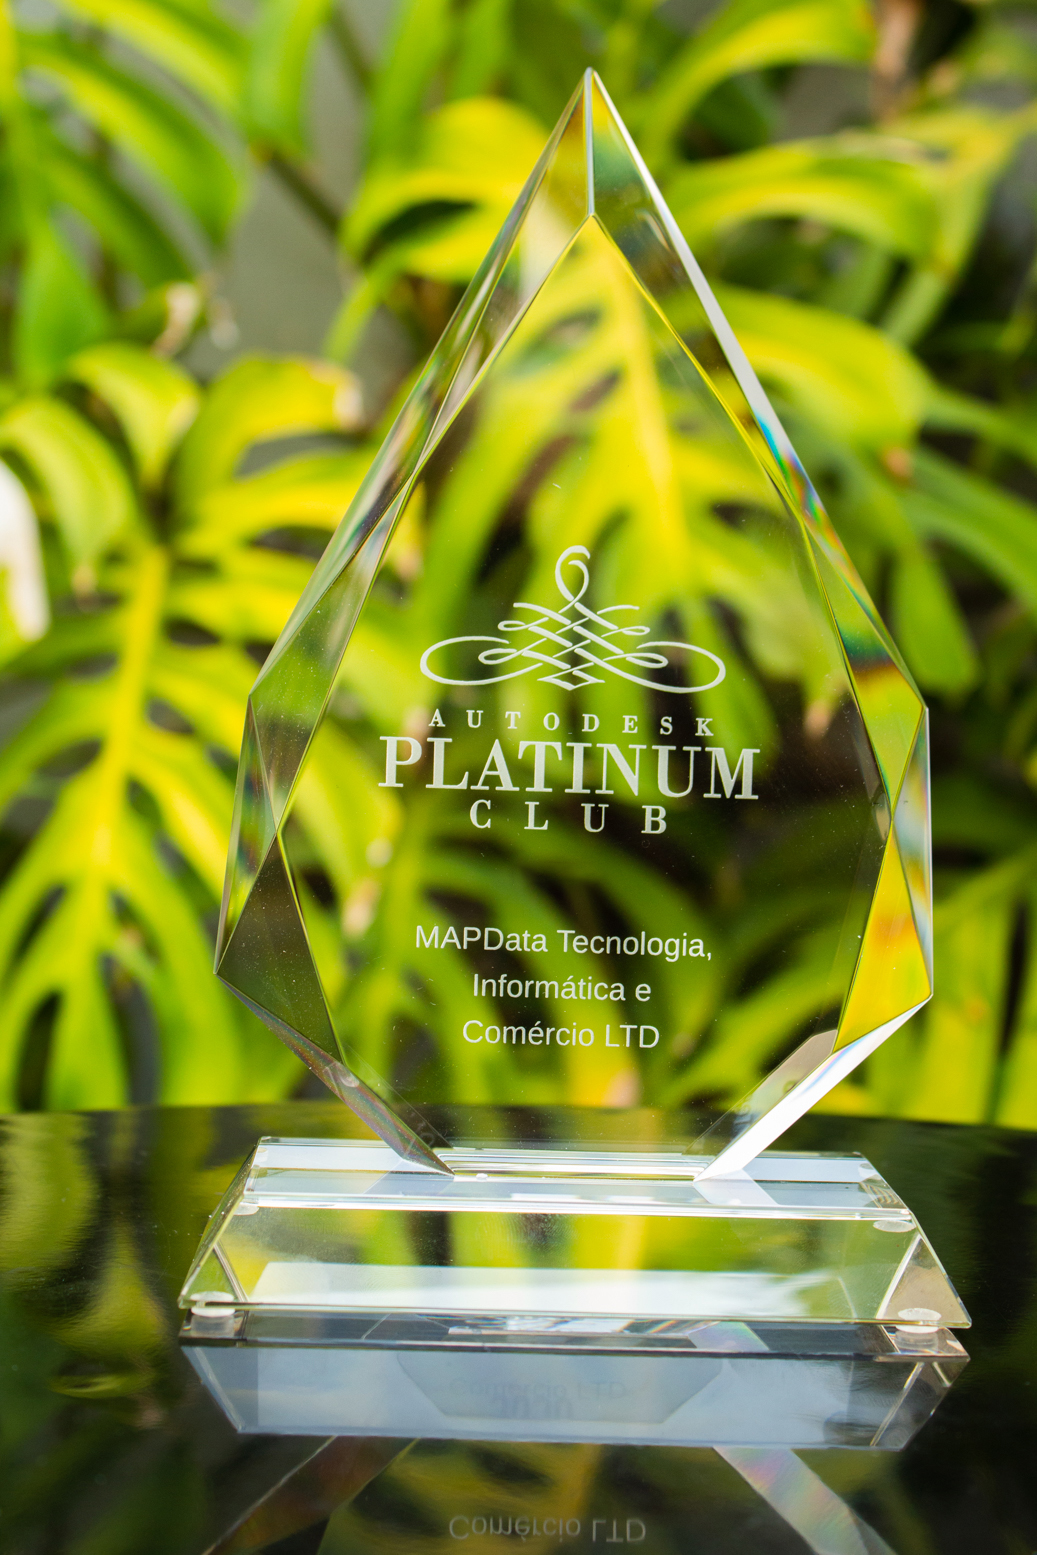 Prêmio Autodesk Platinum Club Award 2021